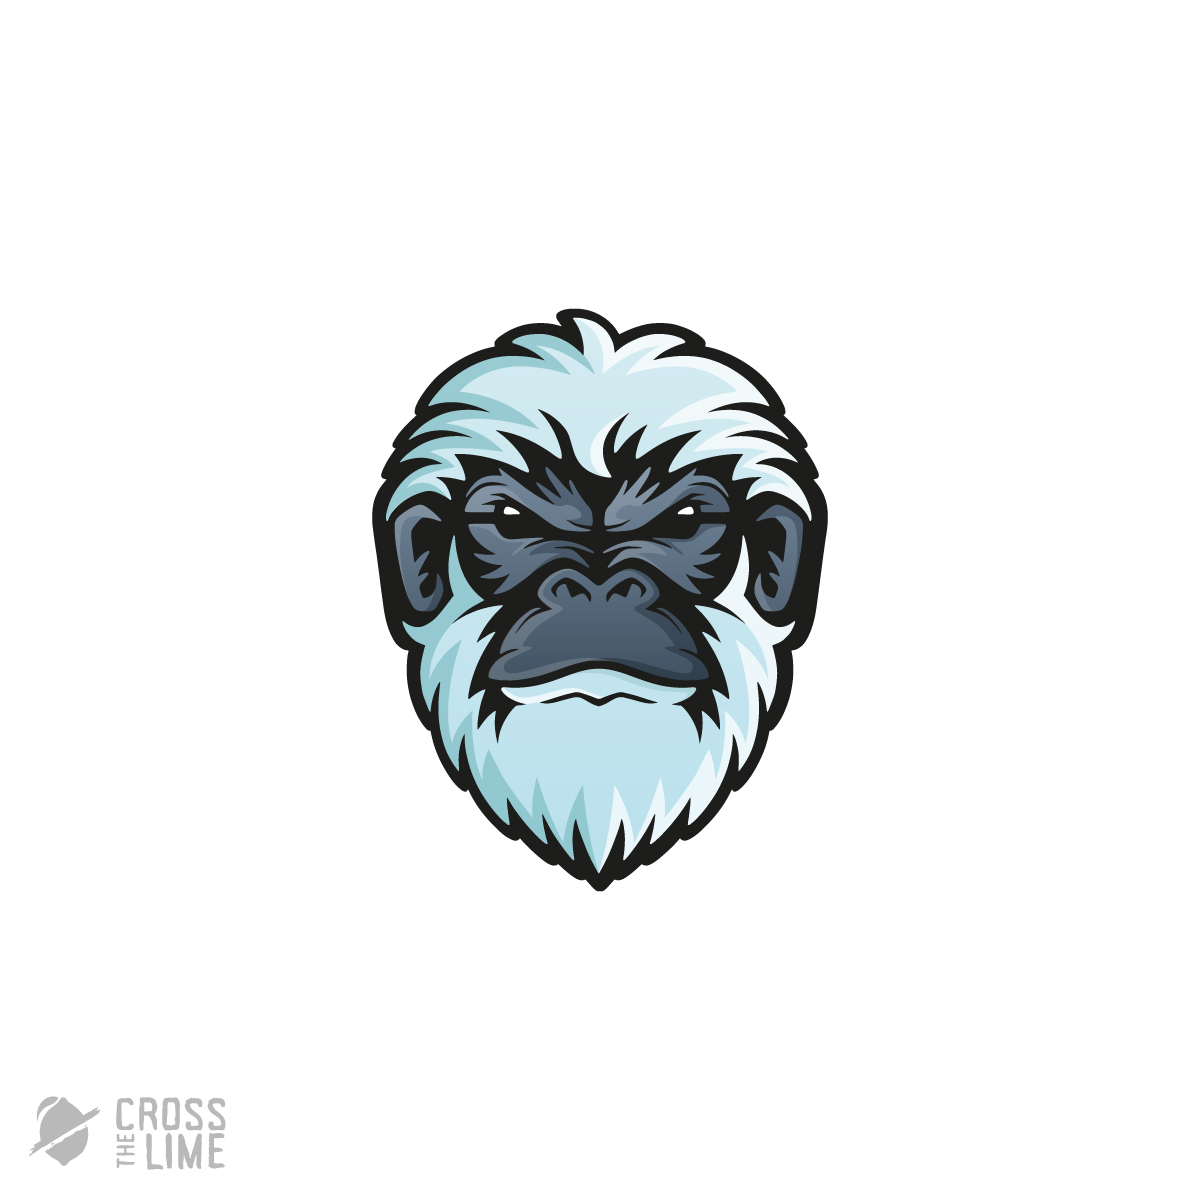 Fierce yeti logo